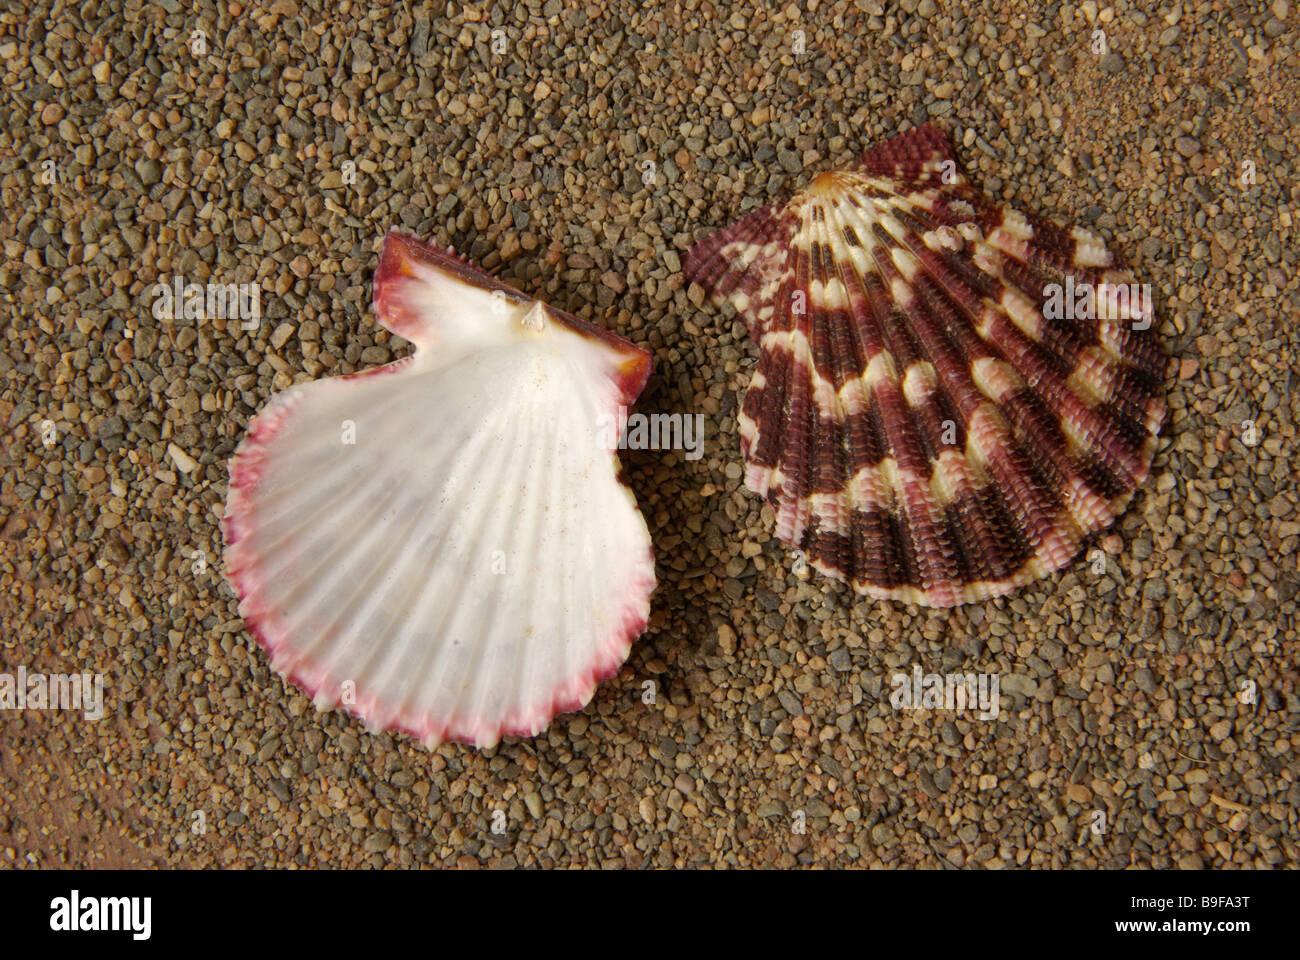 Chlamys pallium - Stock Image